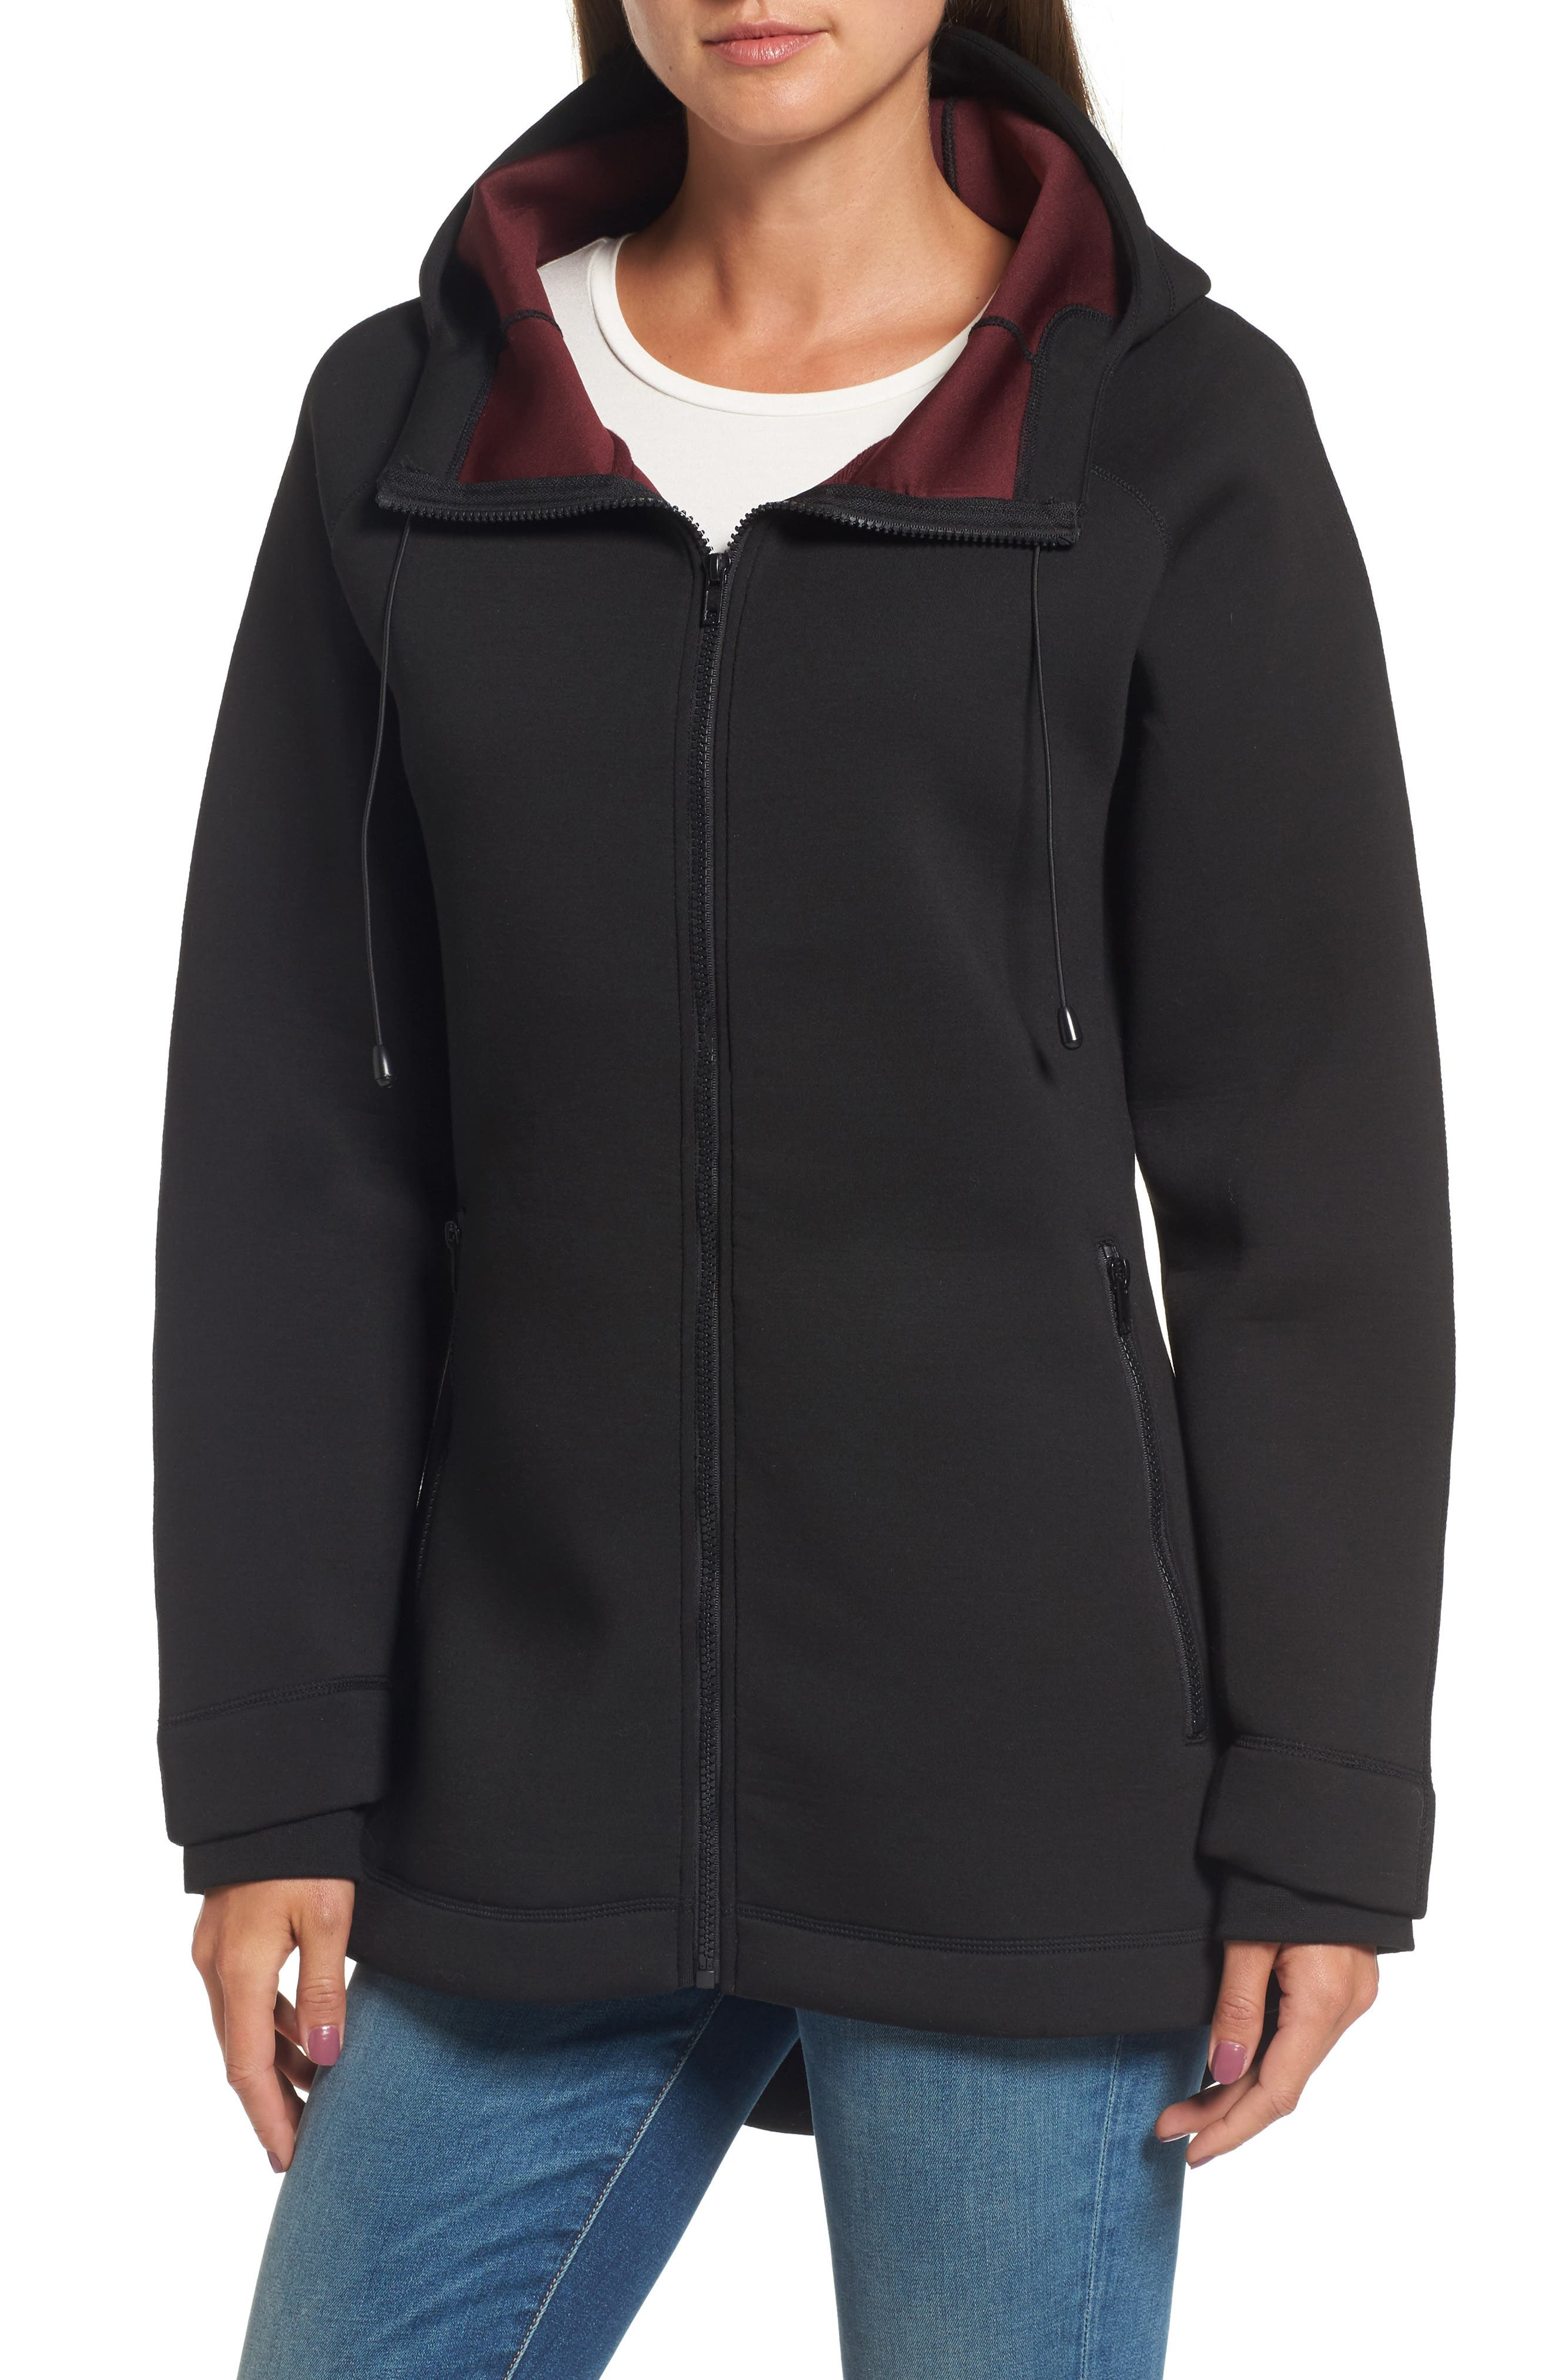 Mono Knit Jacket,                         Main,                         color, Black/ Burgundy